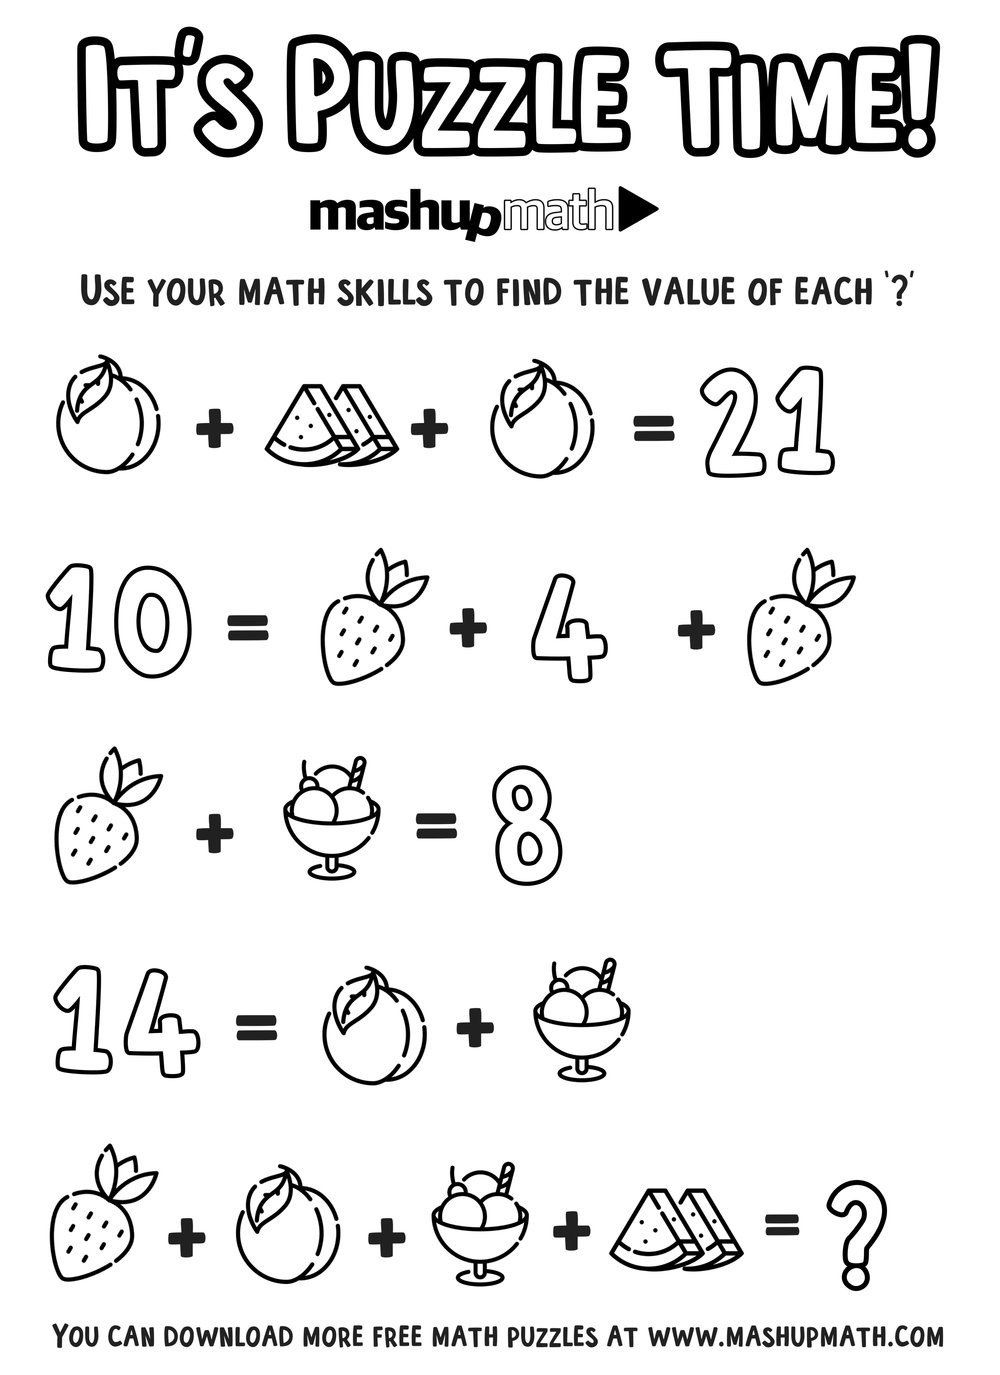 6th Grade Math Puzzles Worksheets Free Math Coloring Worksheets for 5th and  6th Grade — Mashup   Math challenge [ 1375 x 1000 Pixel ]